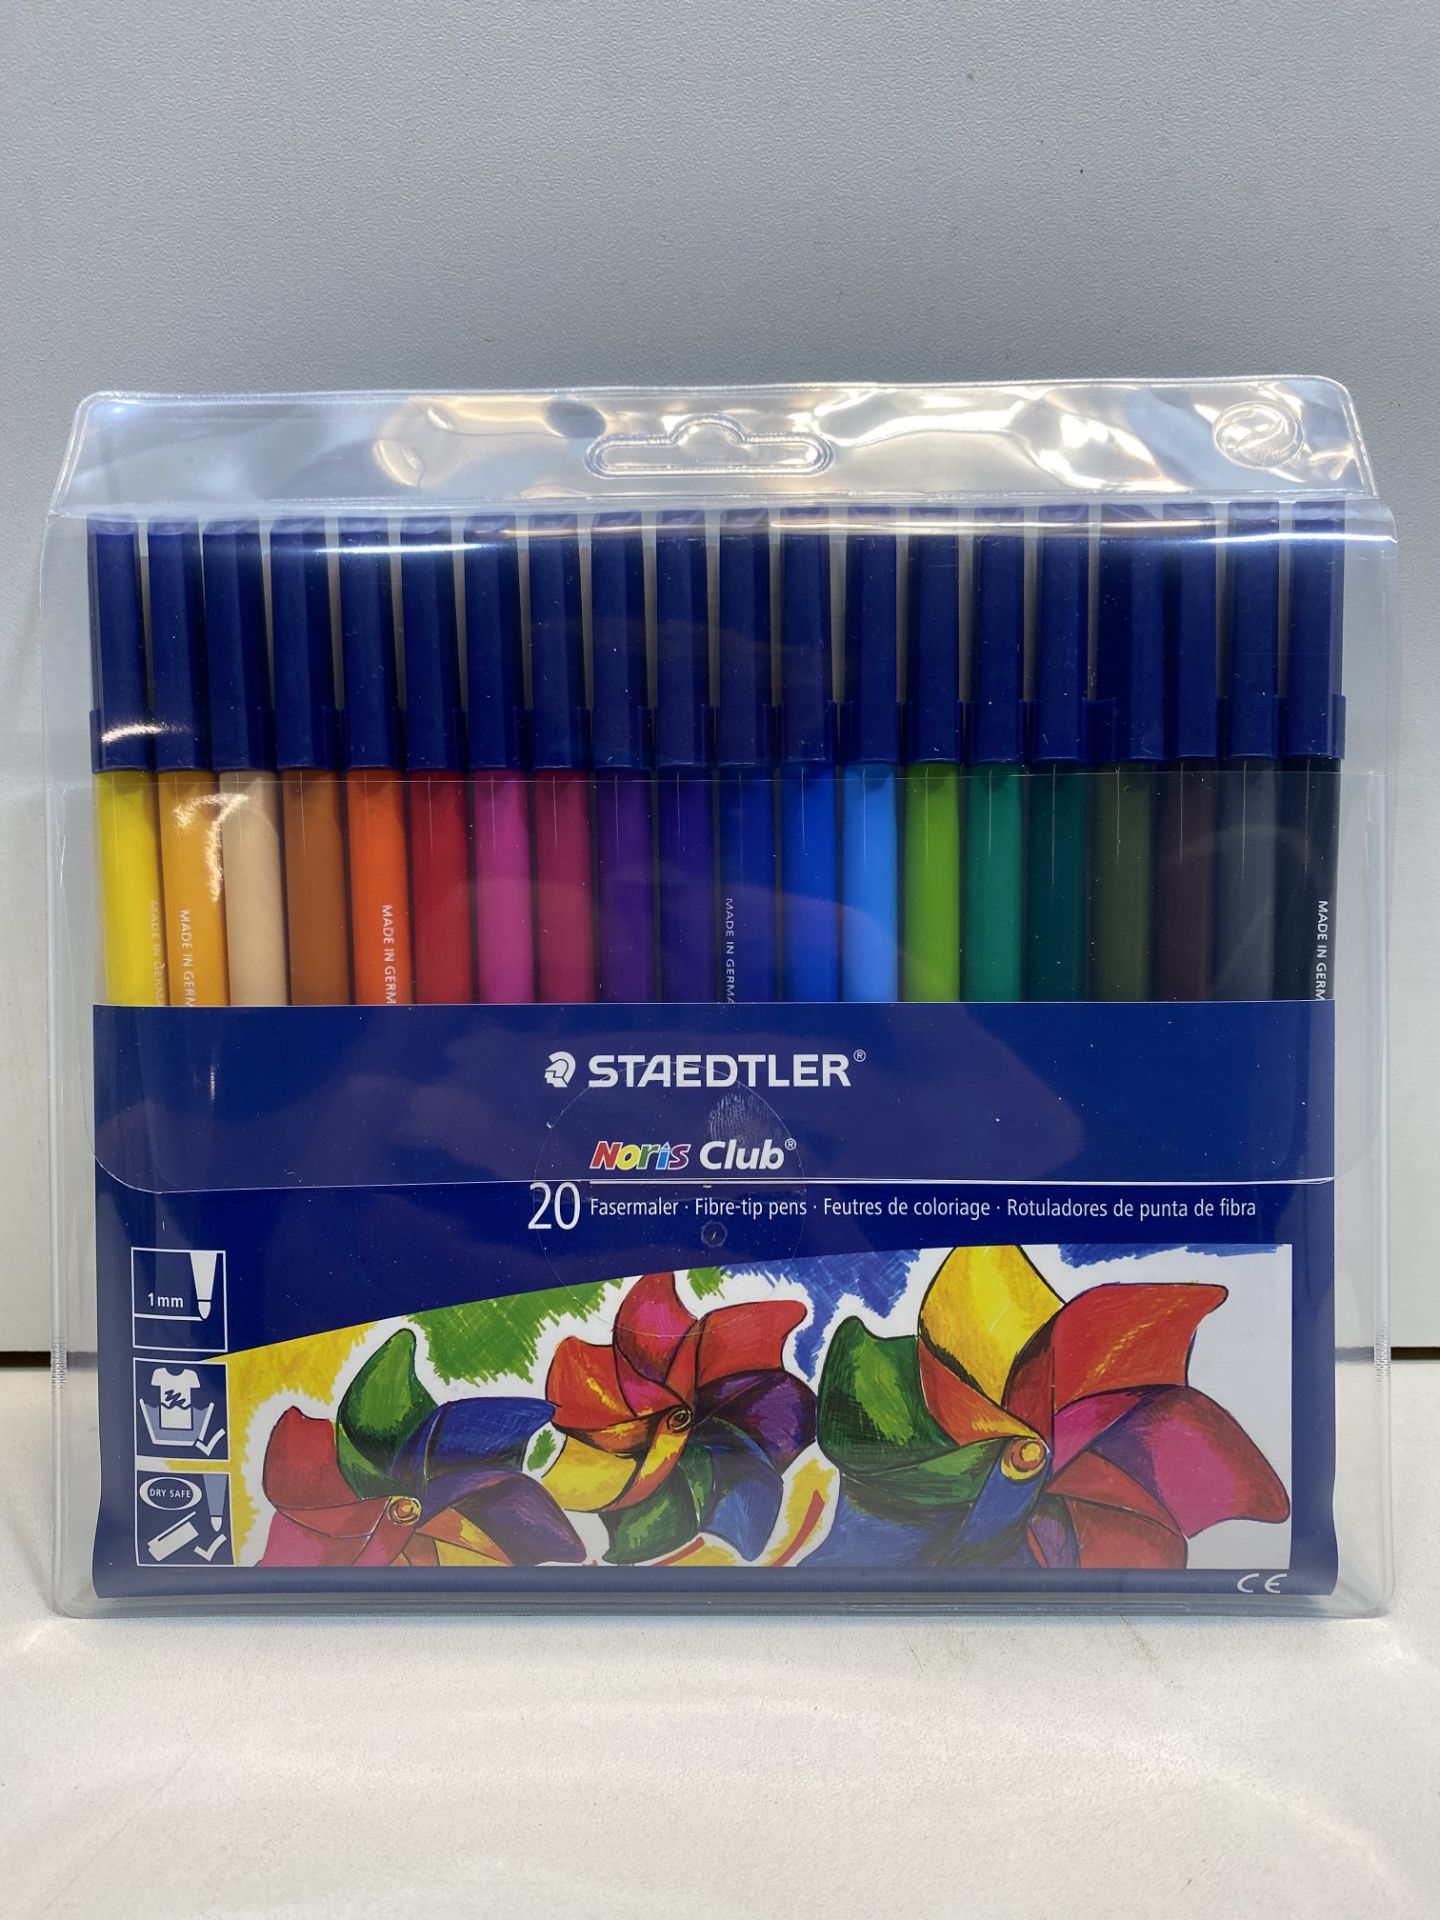 5 x Staedtler Noris Club Fibre Tipped Pens - Pack of 20 | 4007817339664